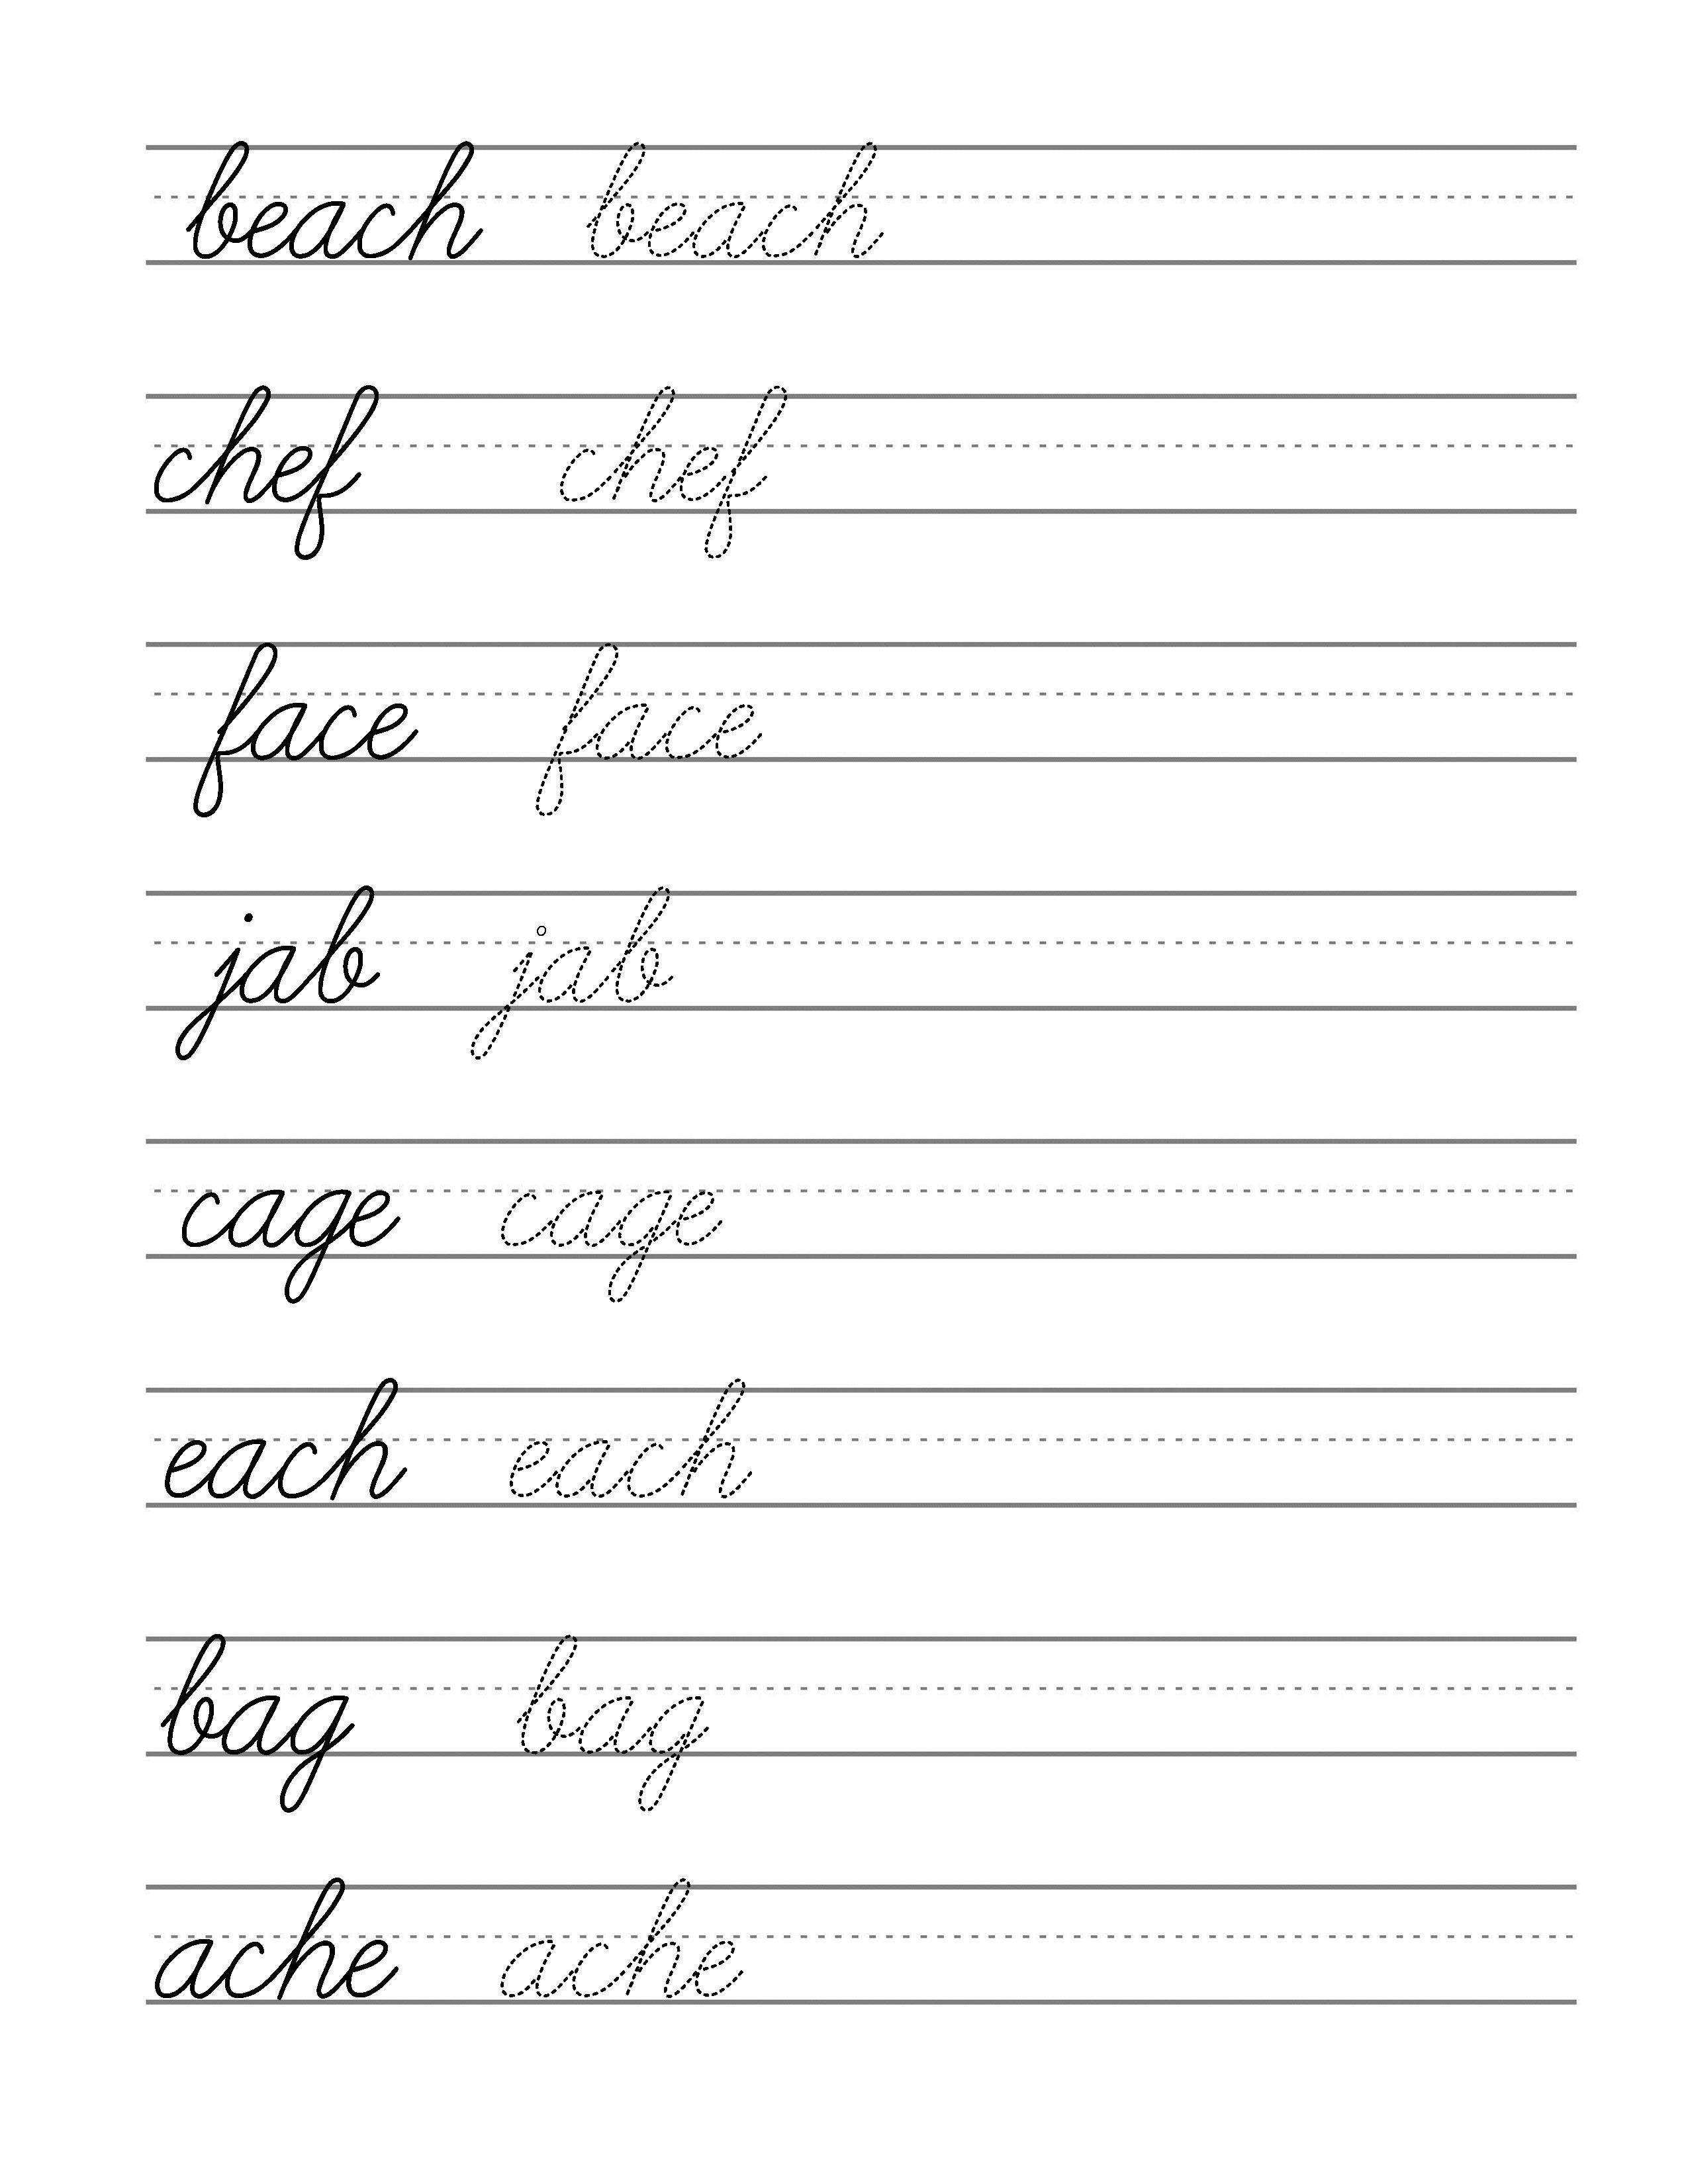 Free Beginning Cursive - Writing Template Part 3 | Writing | Writing - Free Printable Cursive Writing Paragraphs